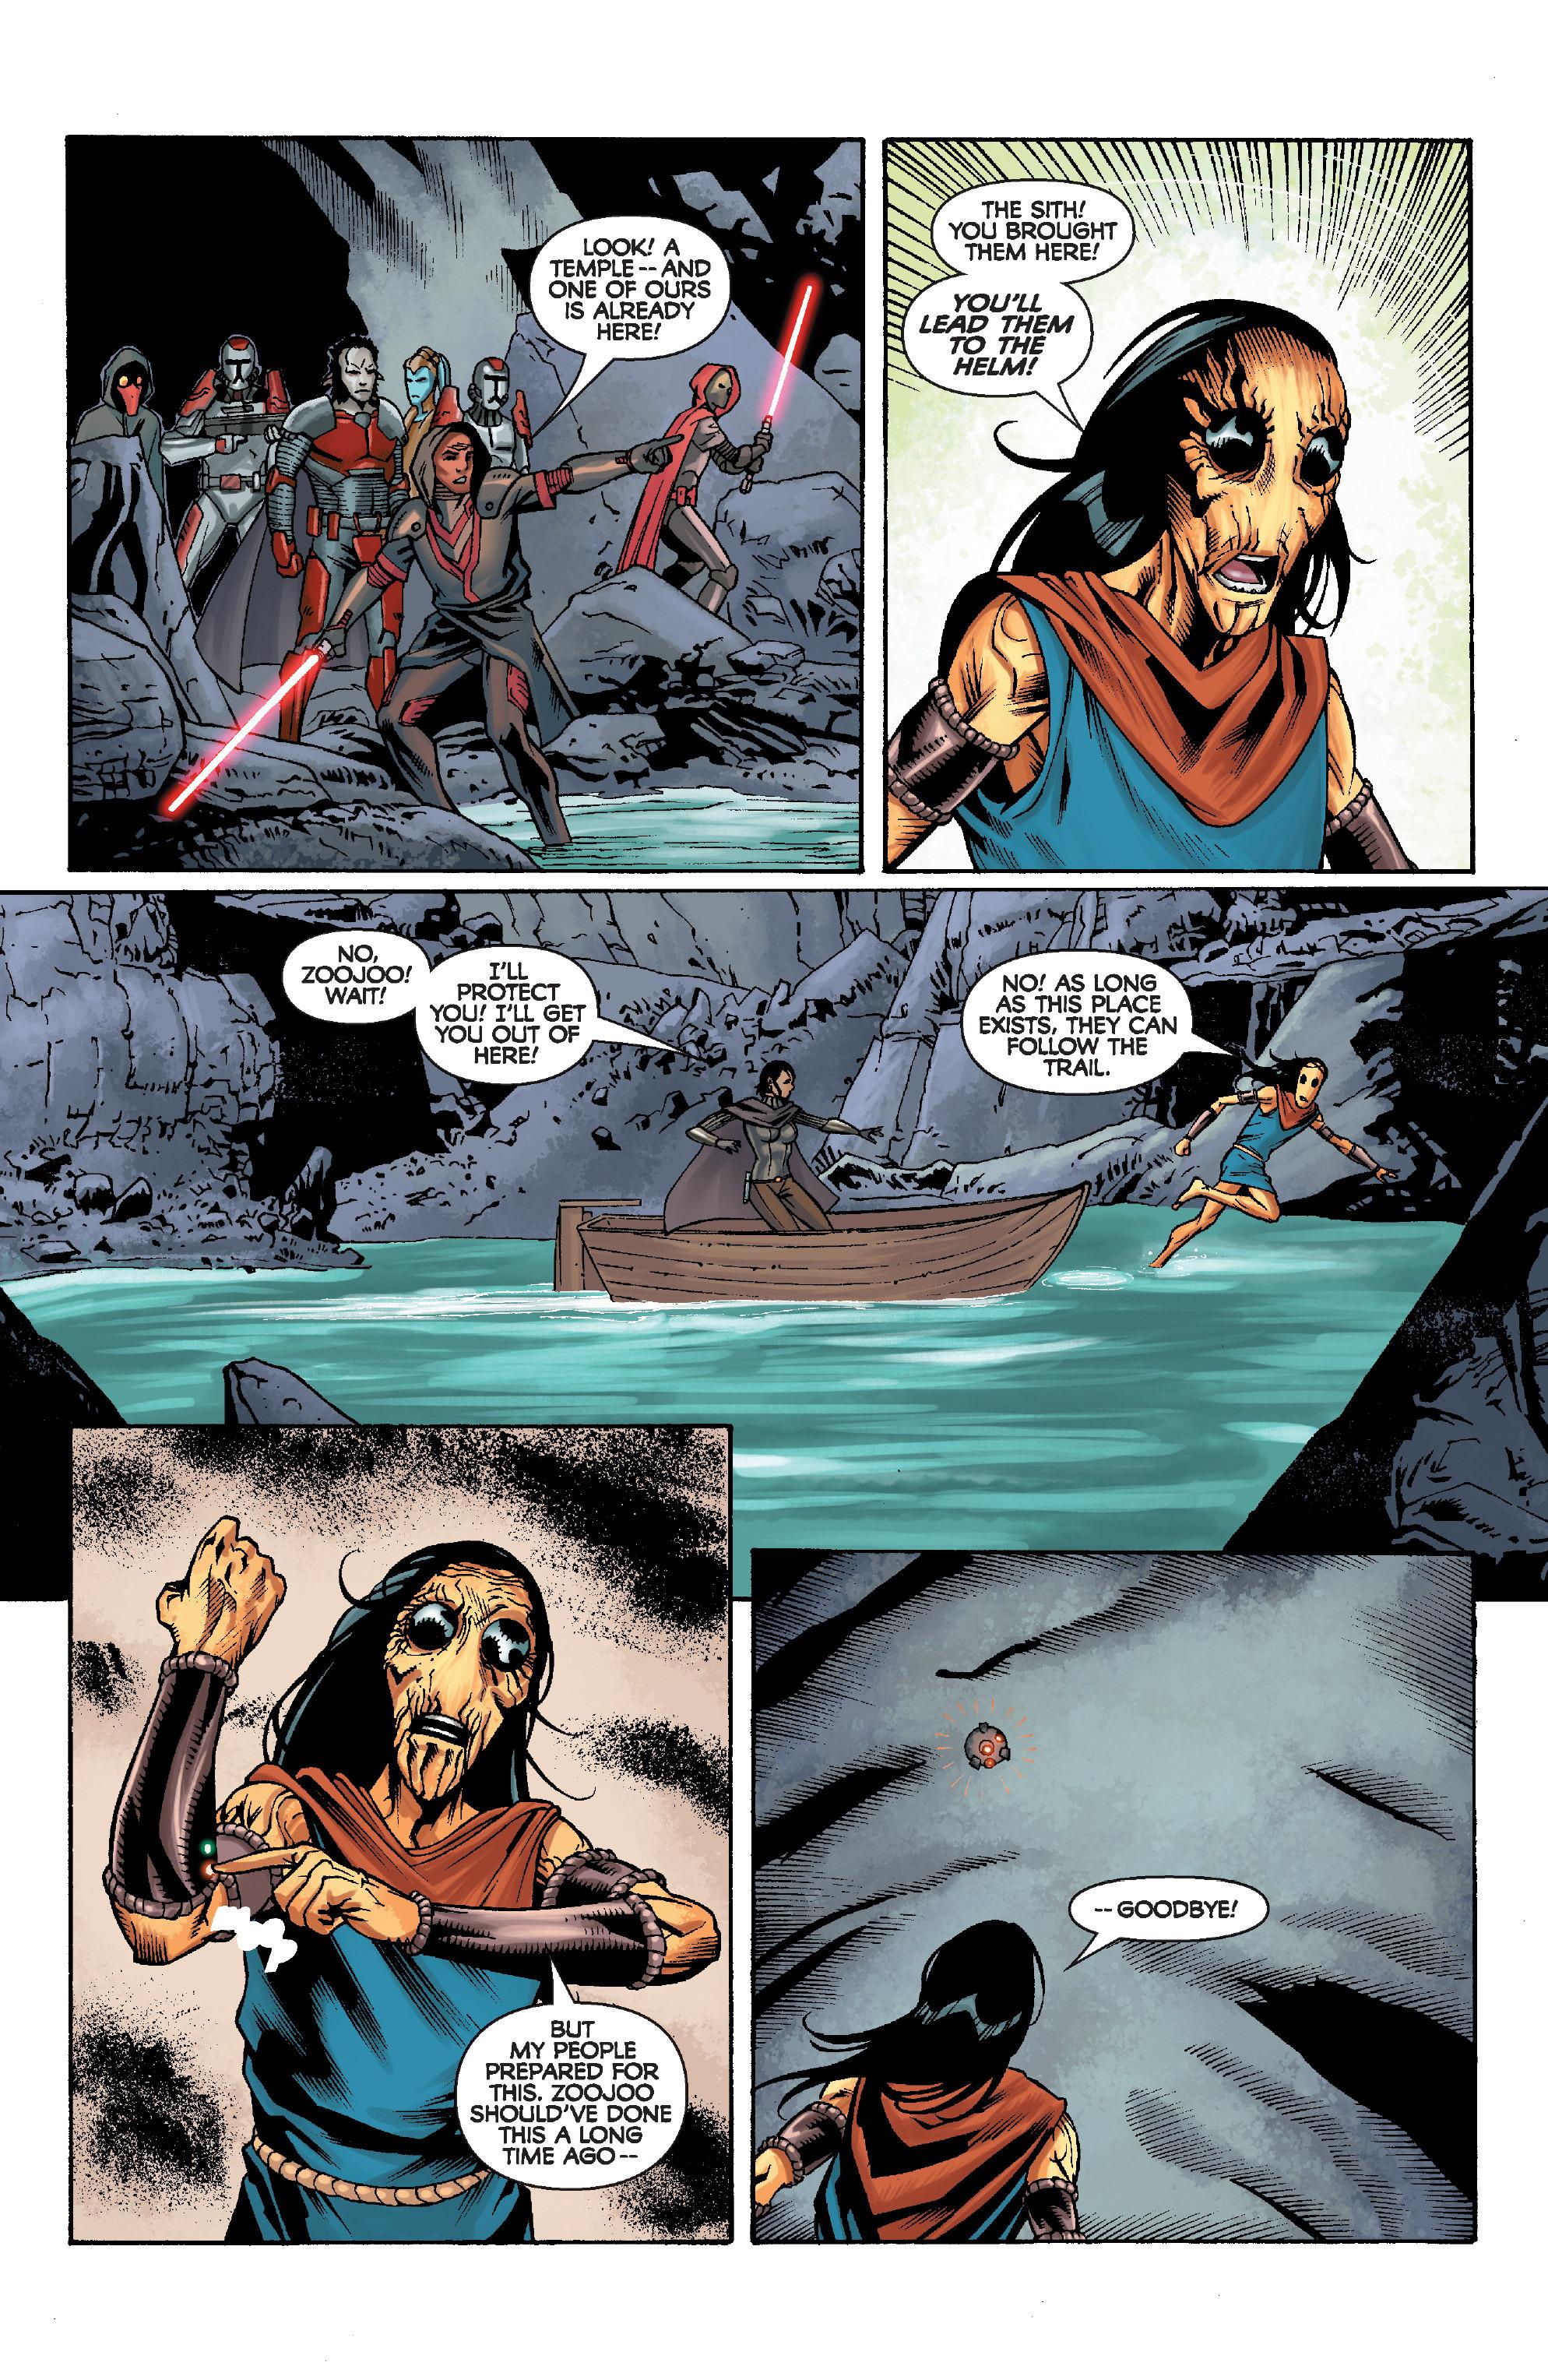 Read online Star Wars: Knight Errant - Escape comic -  Issue #2 - 20